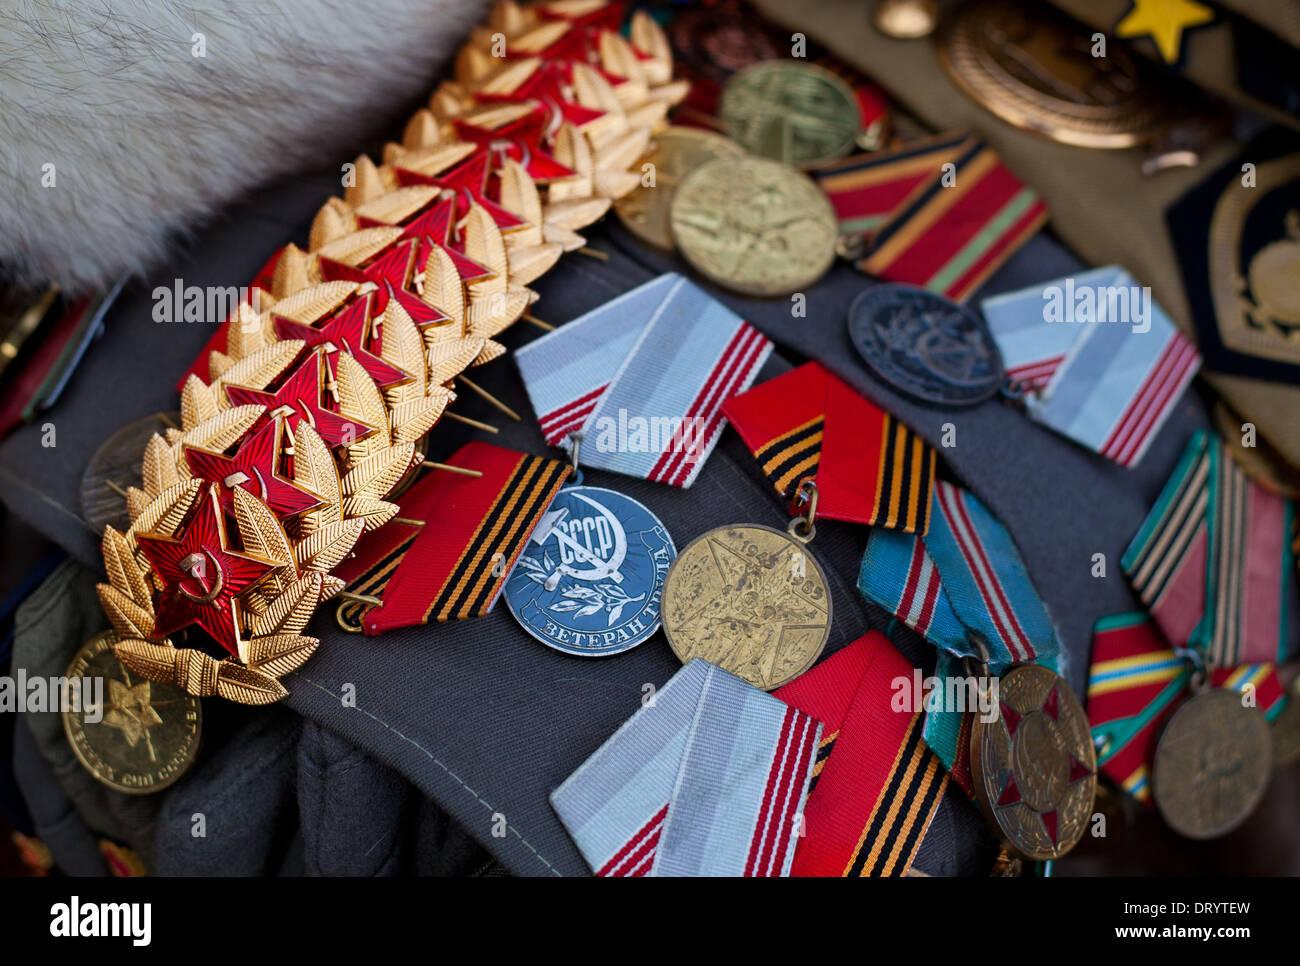 Soviet Union militaria offered at souvenir shop - Stock Image